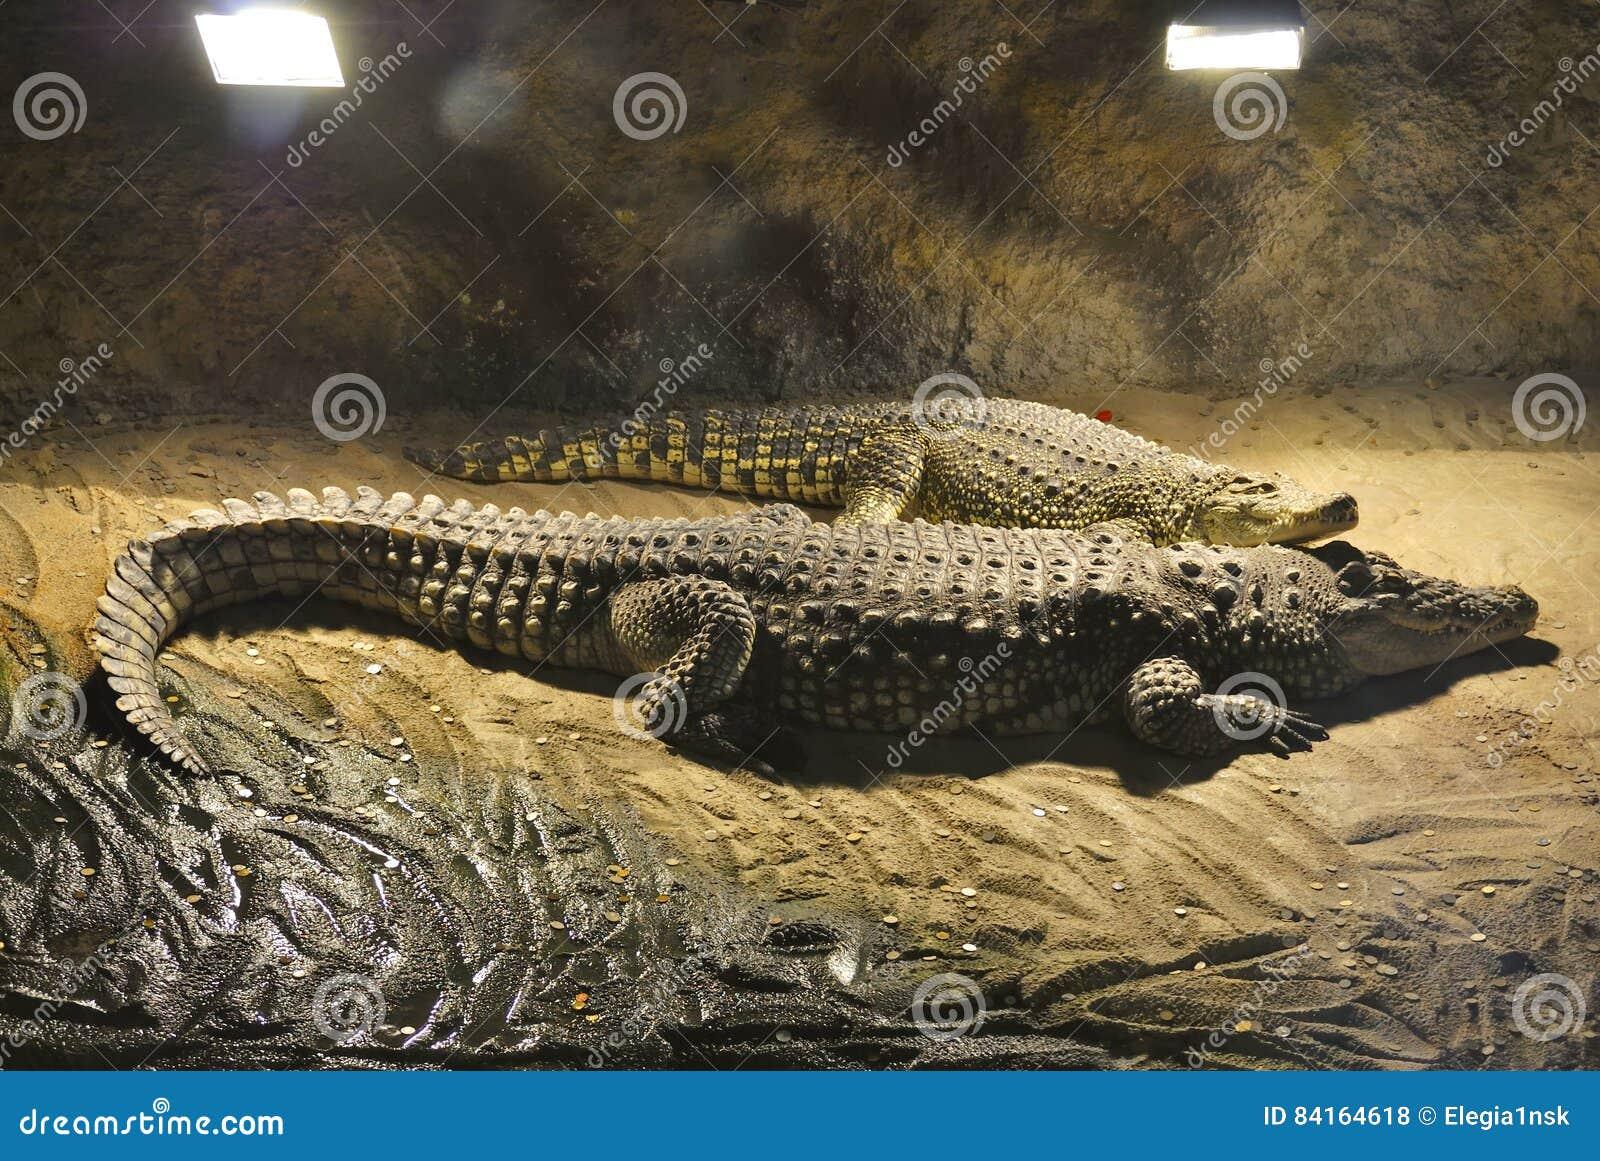 Nile crocodiles, or Crocodylus niloticus